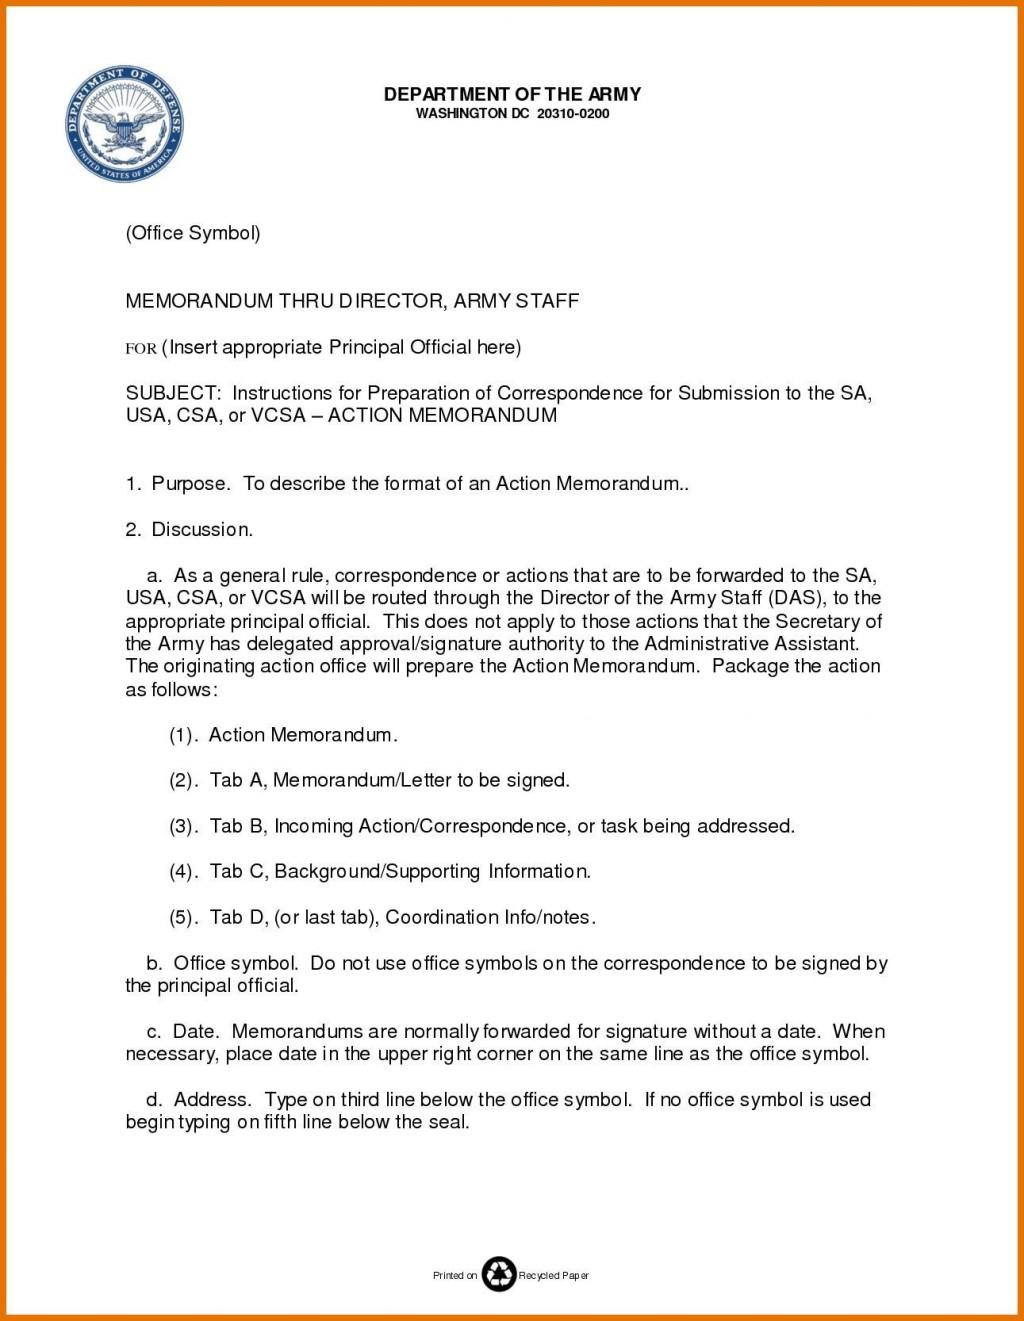 002 Best Microsoft Word Army Memorandum Template High Def Large